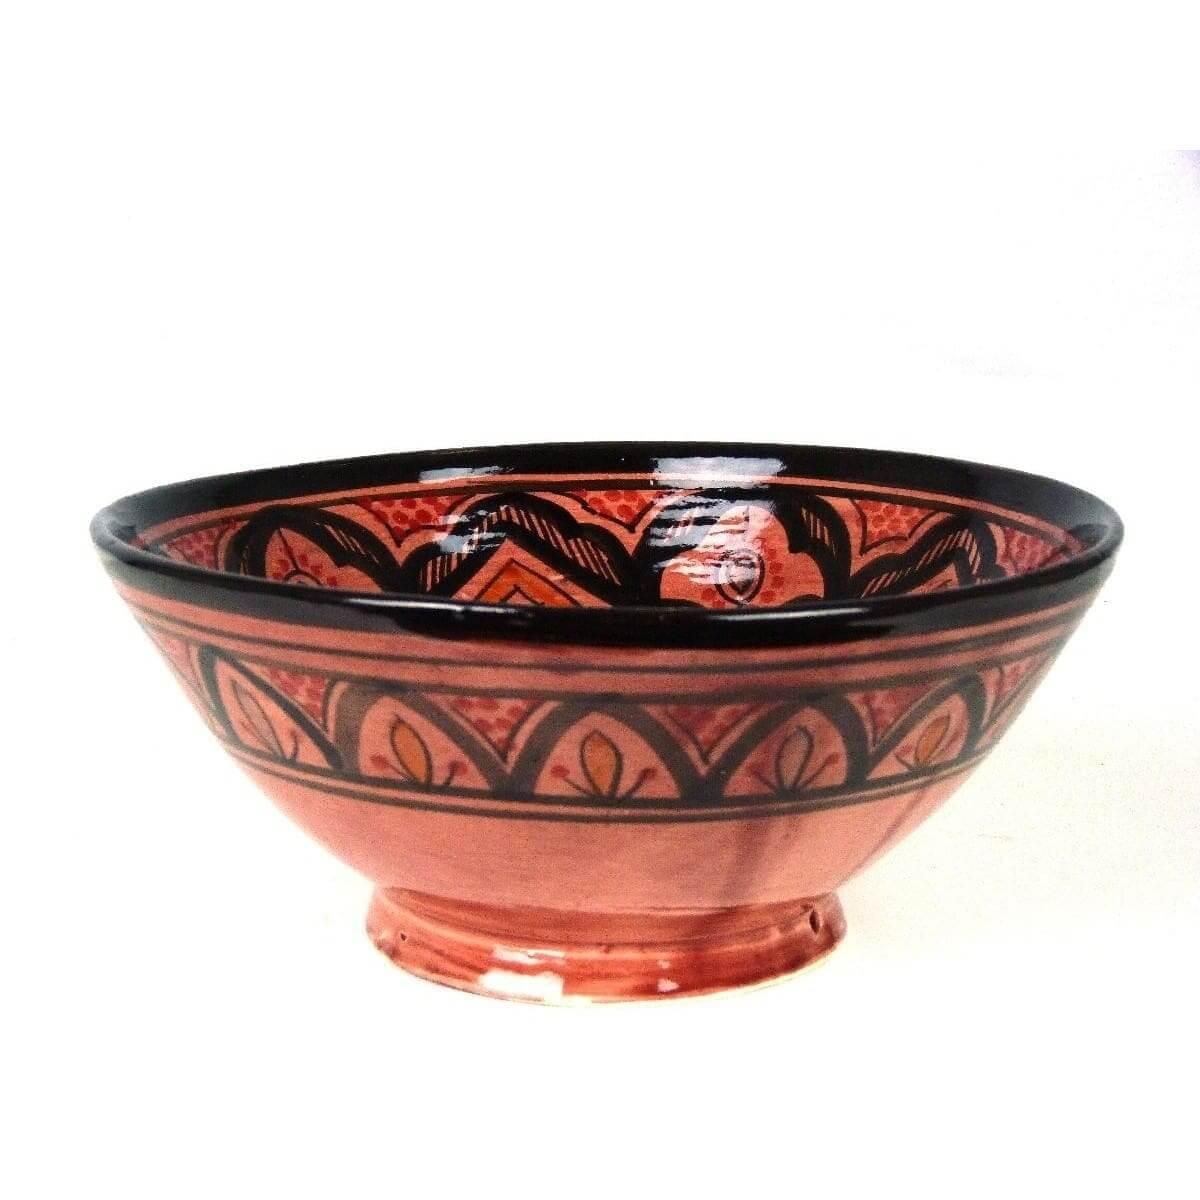 orientalische marokkanische keramikschale keramik obst. Black Bedroom Furniture Sets. Home Design Ideas